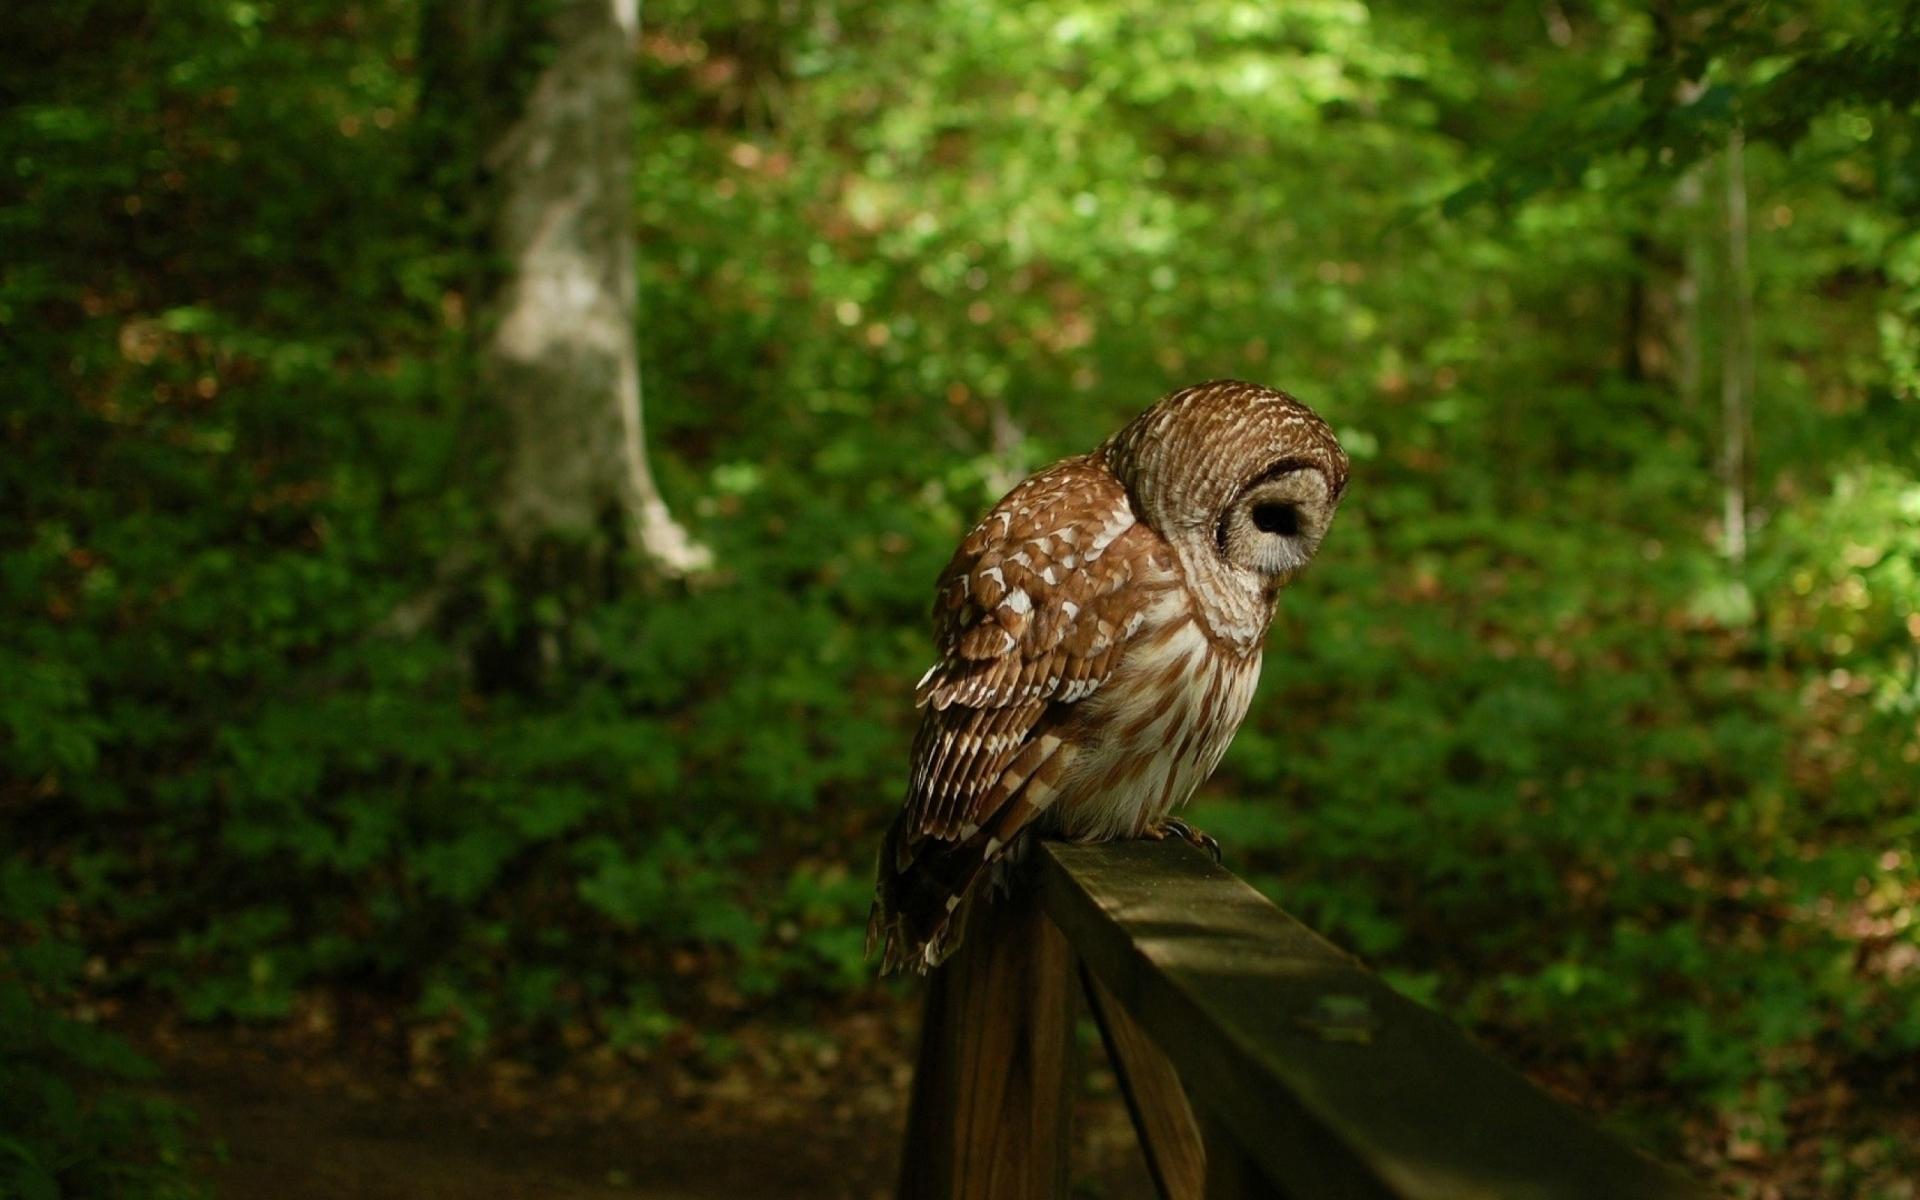 Картинки сова, птица, хищник, лес фото и обои на рабочий стол